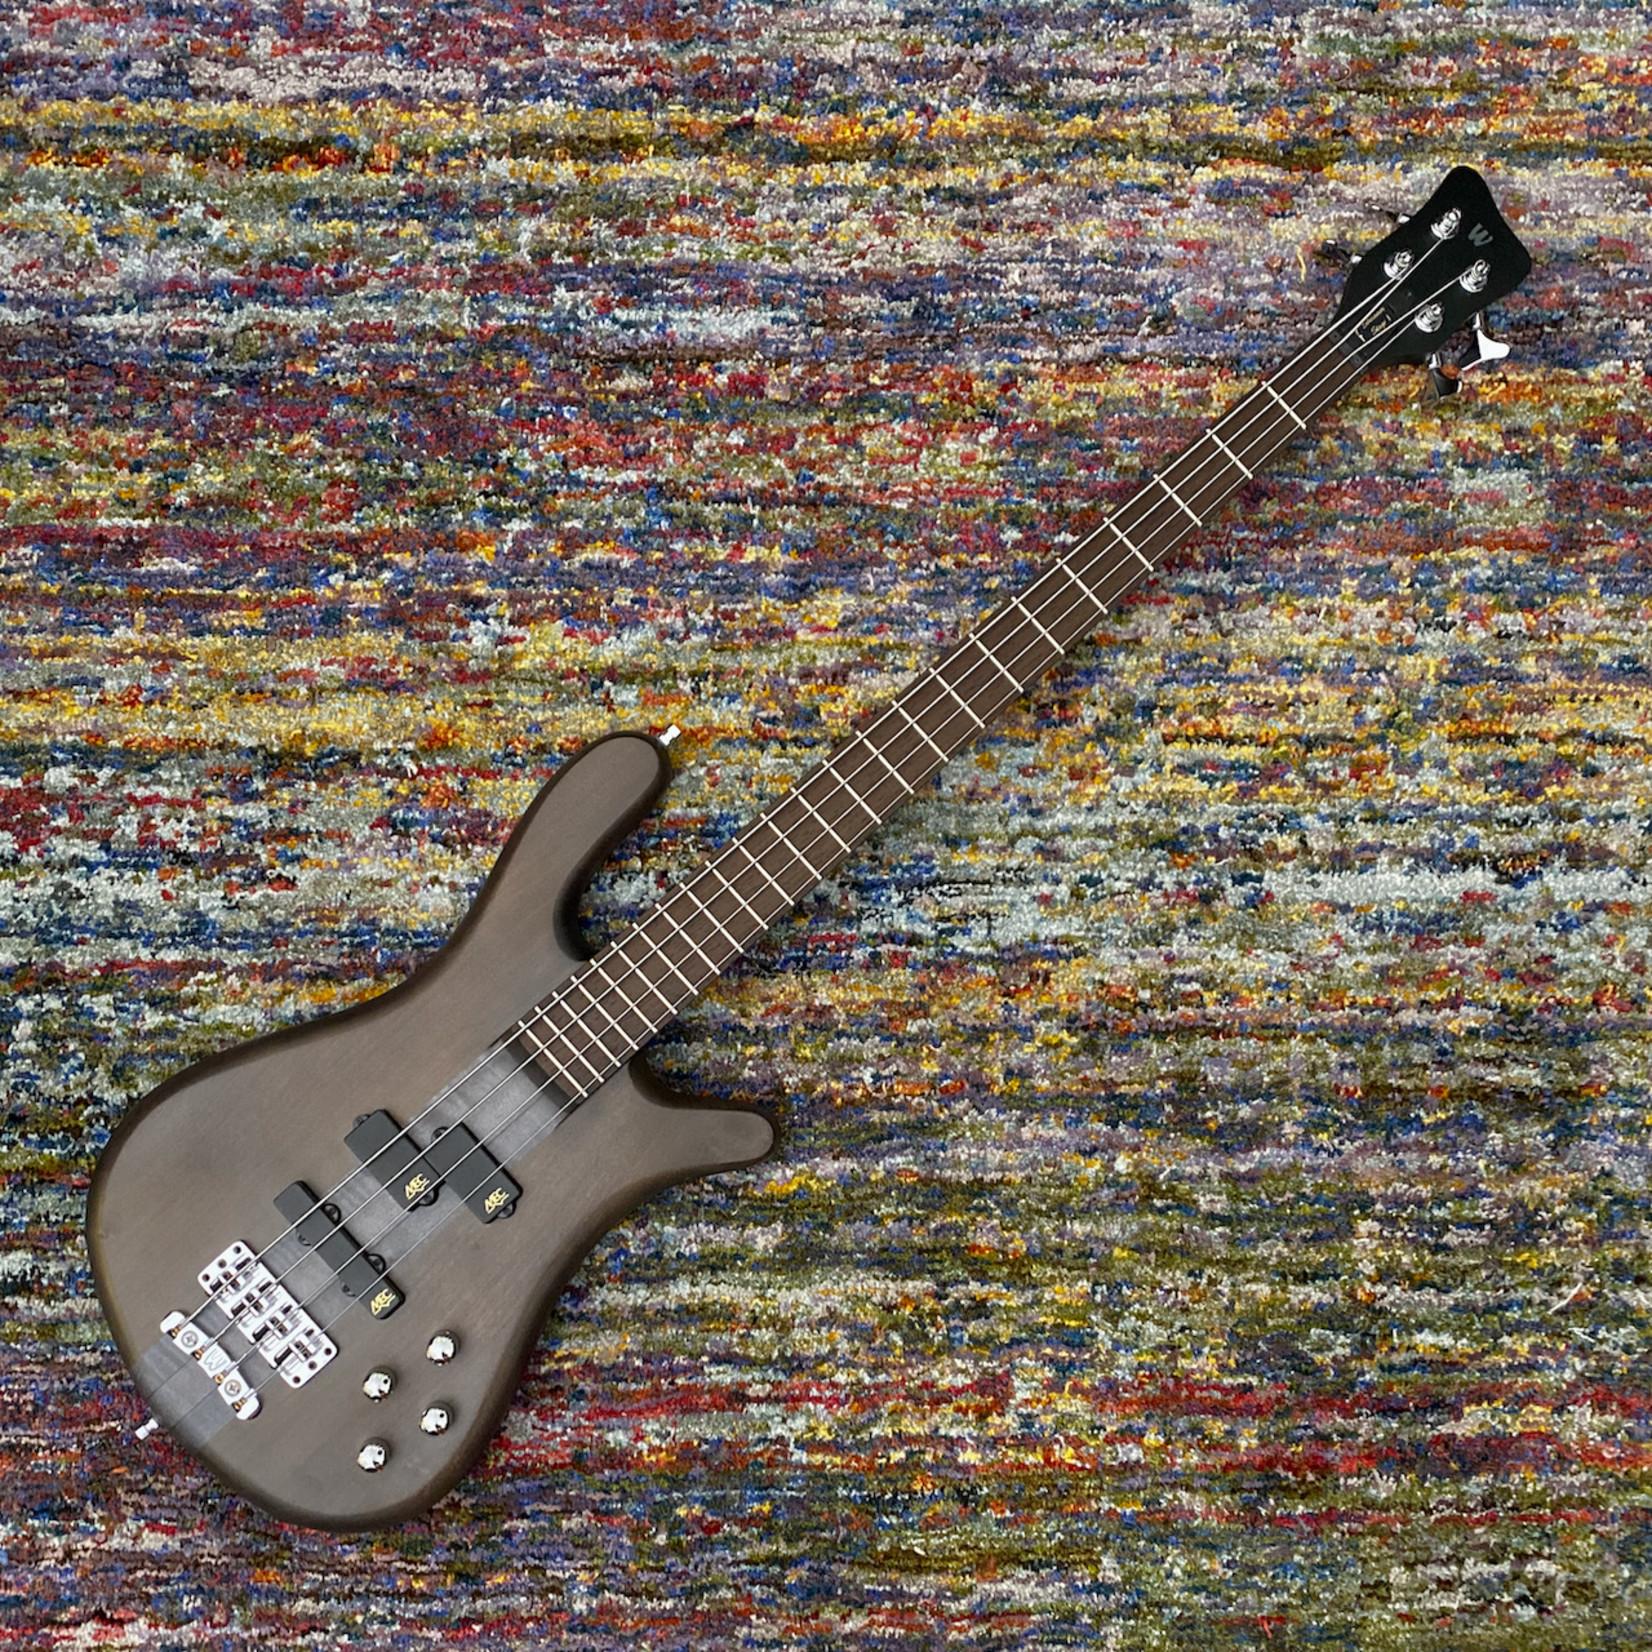 Warwick Warwick Team Built Streamer Stage I, 4-String Bass - Nirvana Black Transparent Satin